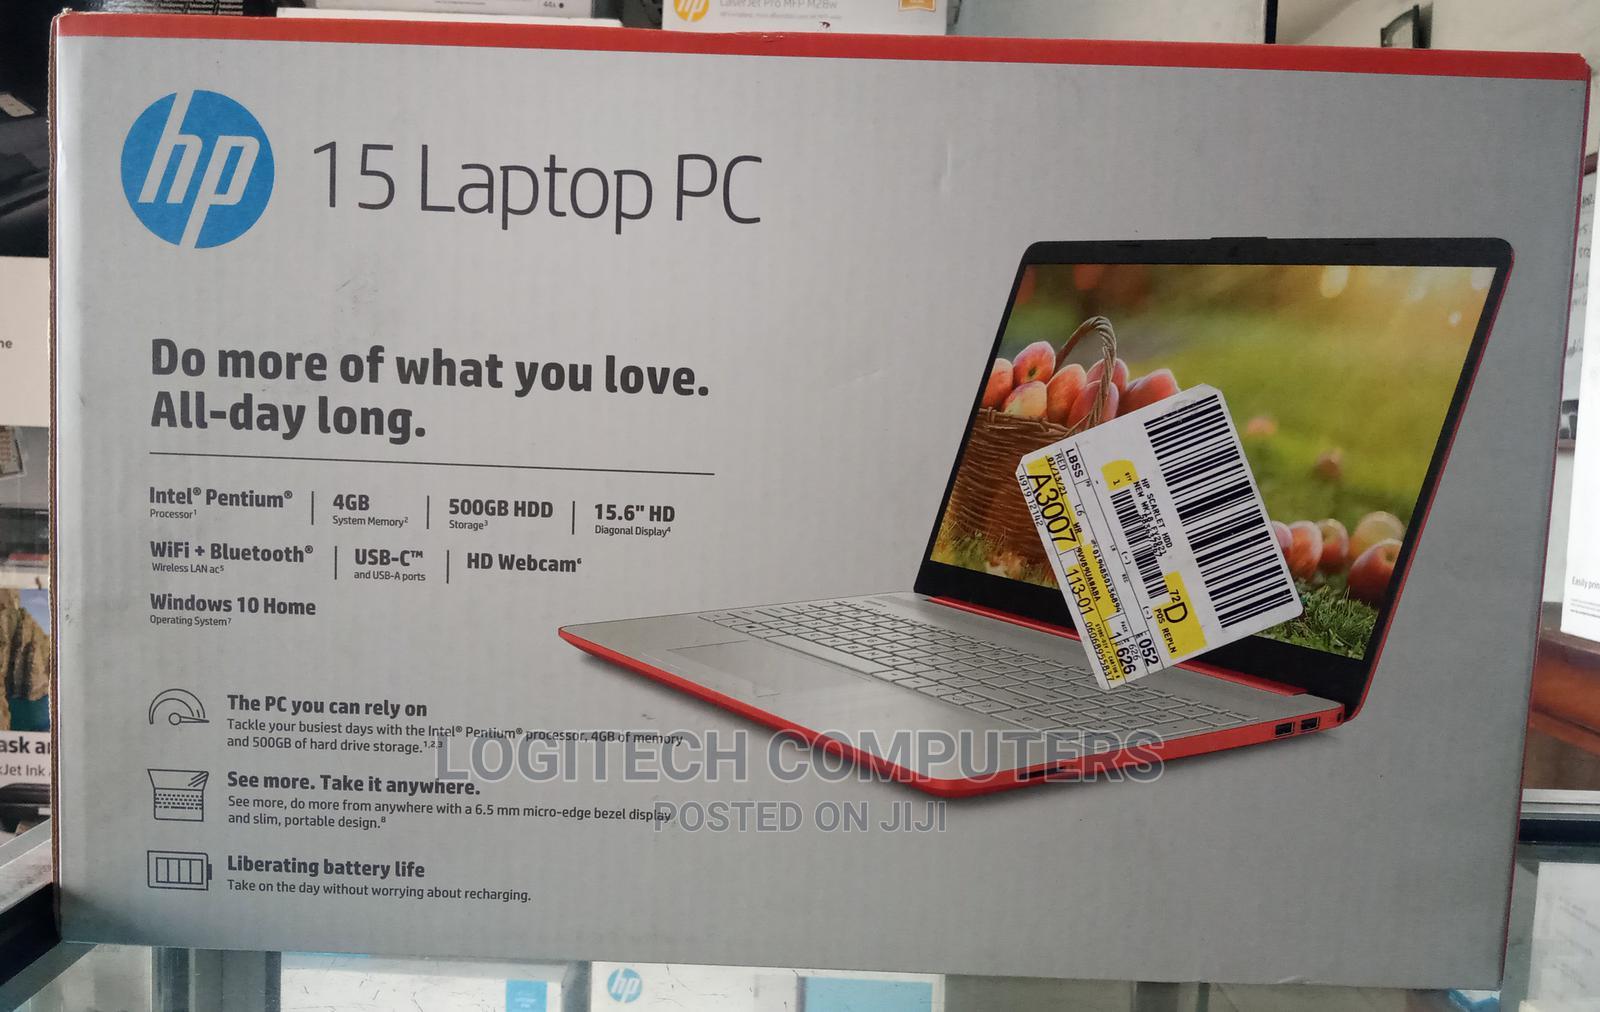 New Laptop HP 4GB Intel Pentium SSD 128GB | Laptops & Computers for sale in Warri, Delta State, Nigeria